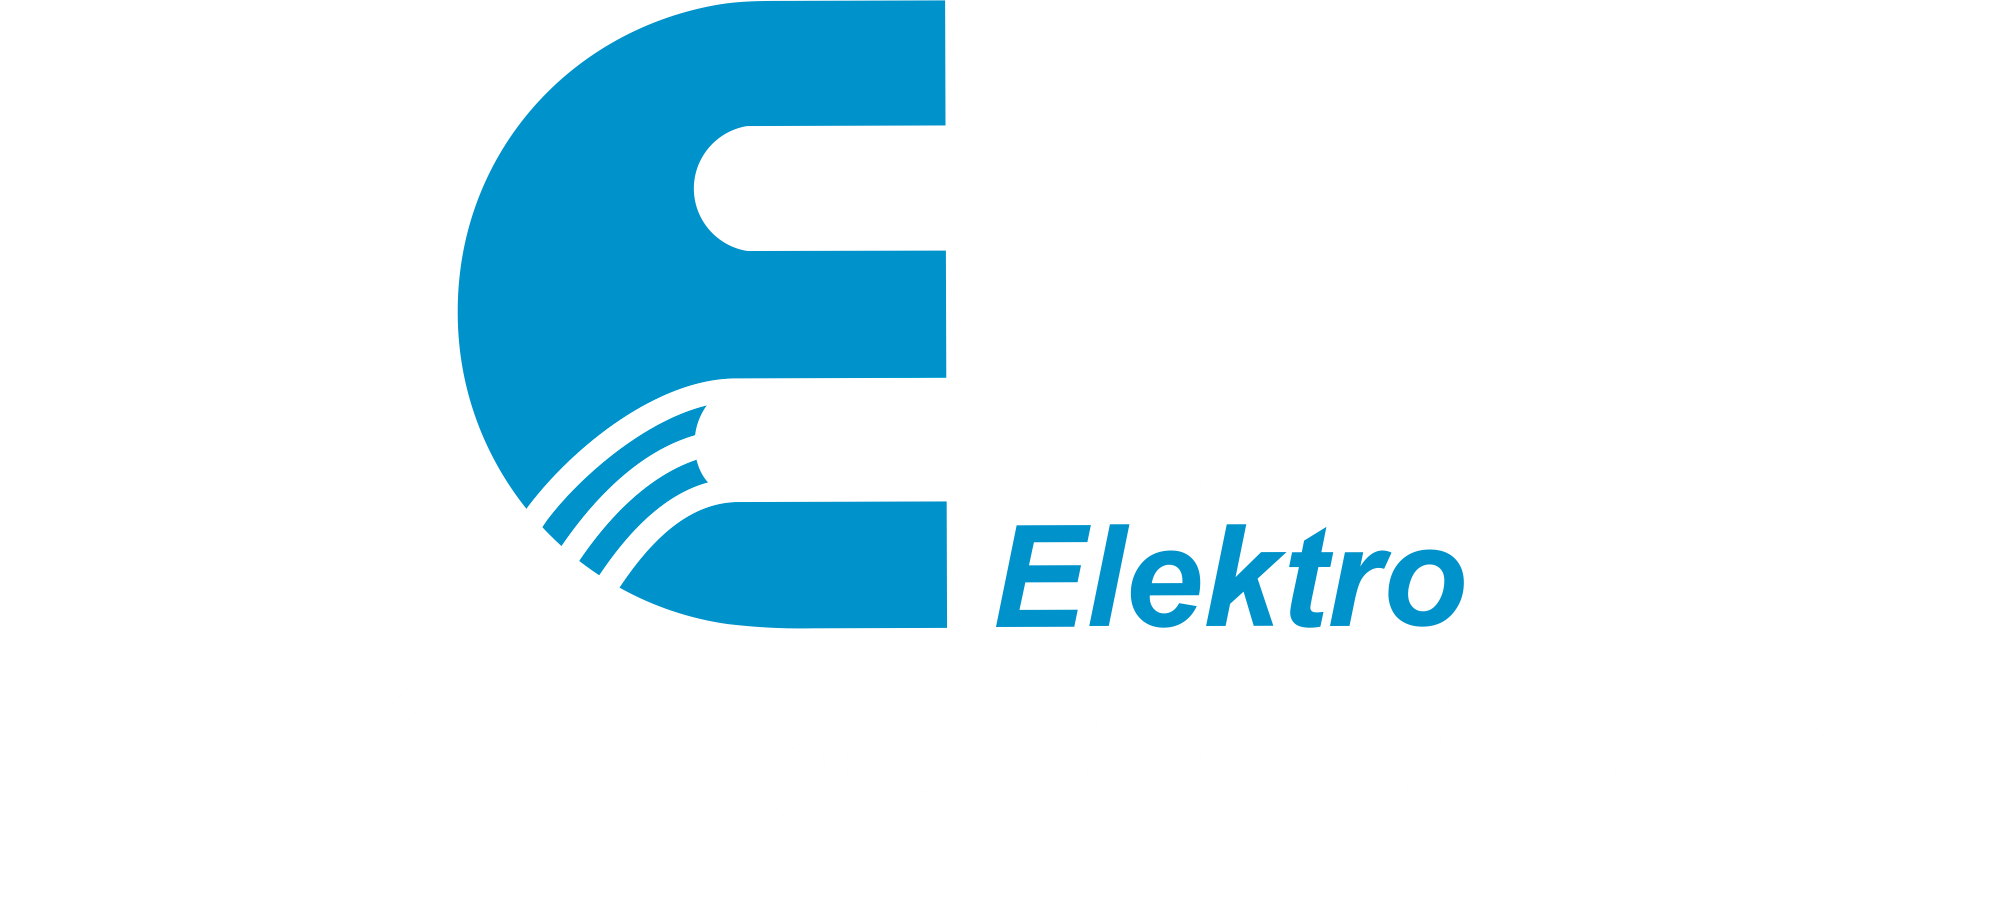 Elektro Spechtenhauser GmbH